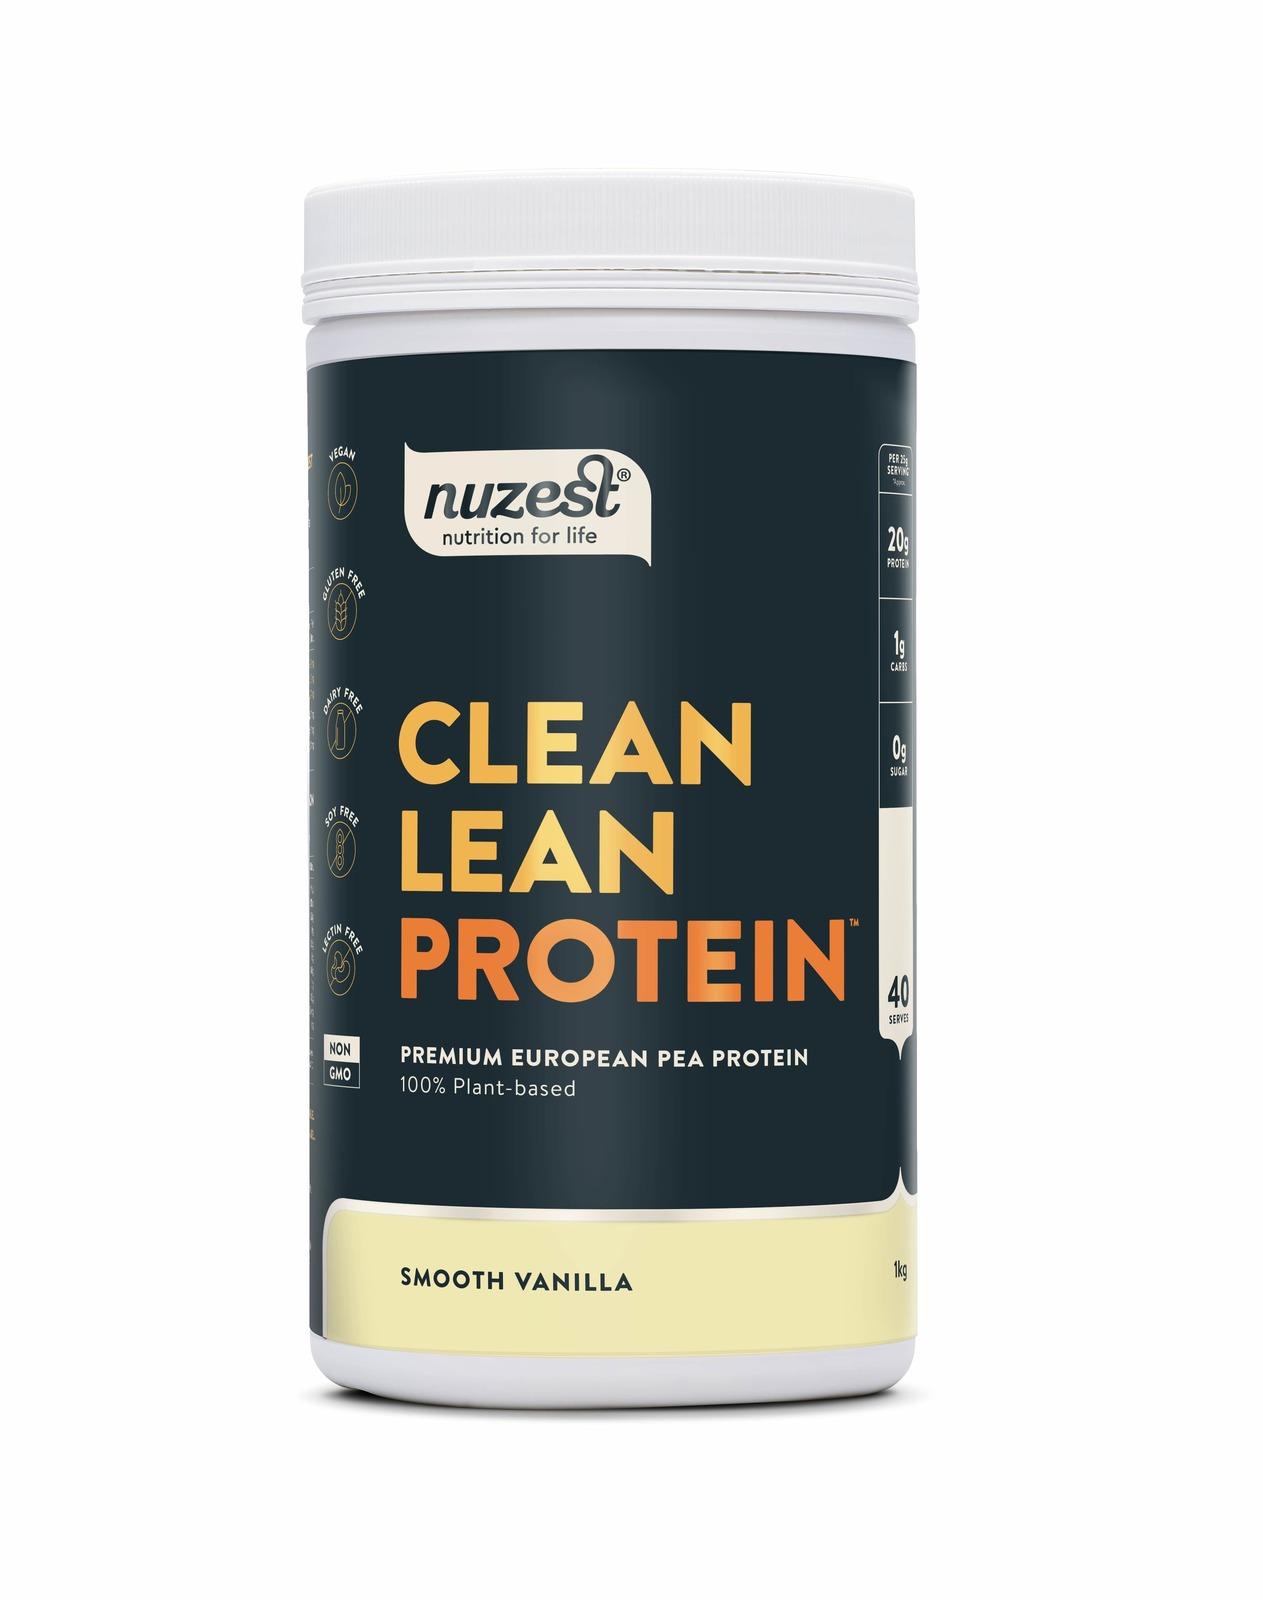 Nuzest Clean Lean Plant Based Protein Powder - Smooth Vanilla (1kg) image